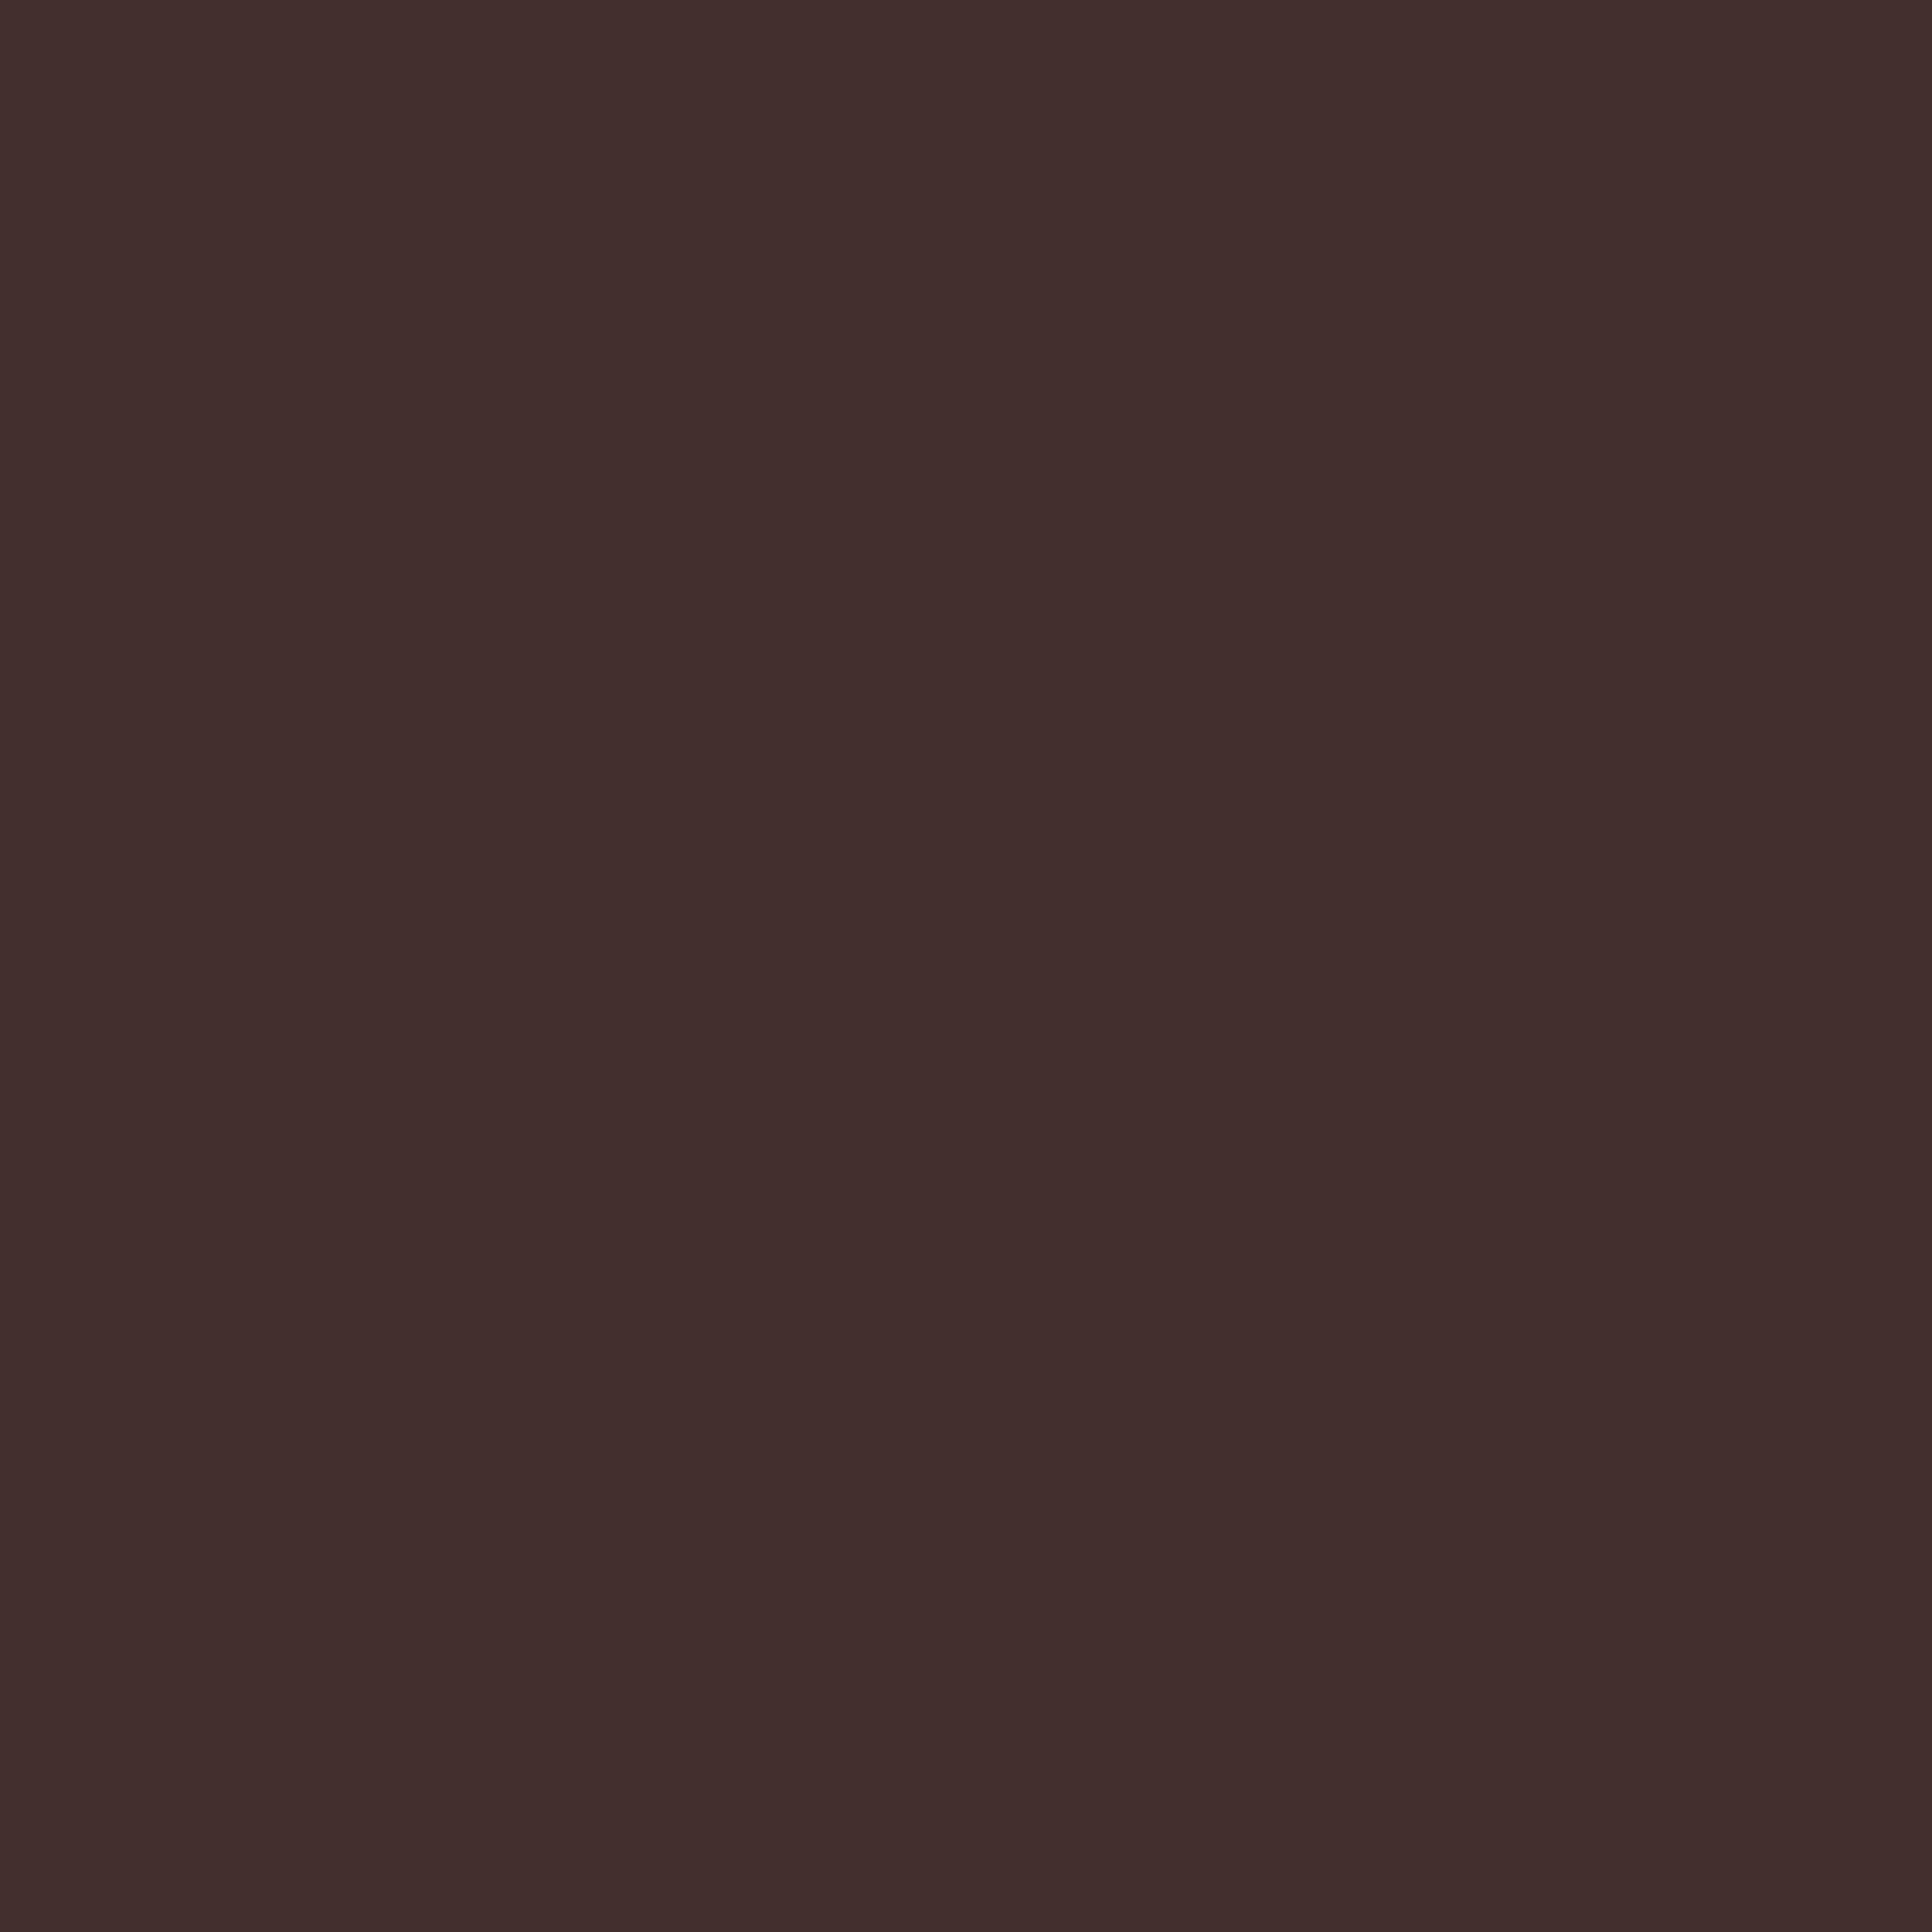 2048x2048 Old Burgundy Solid Color Background